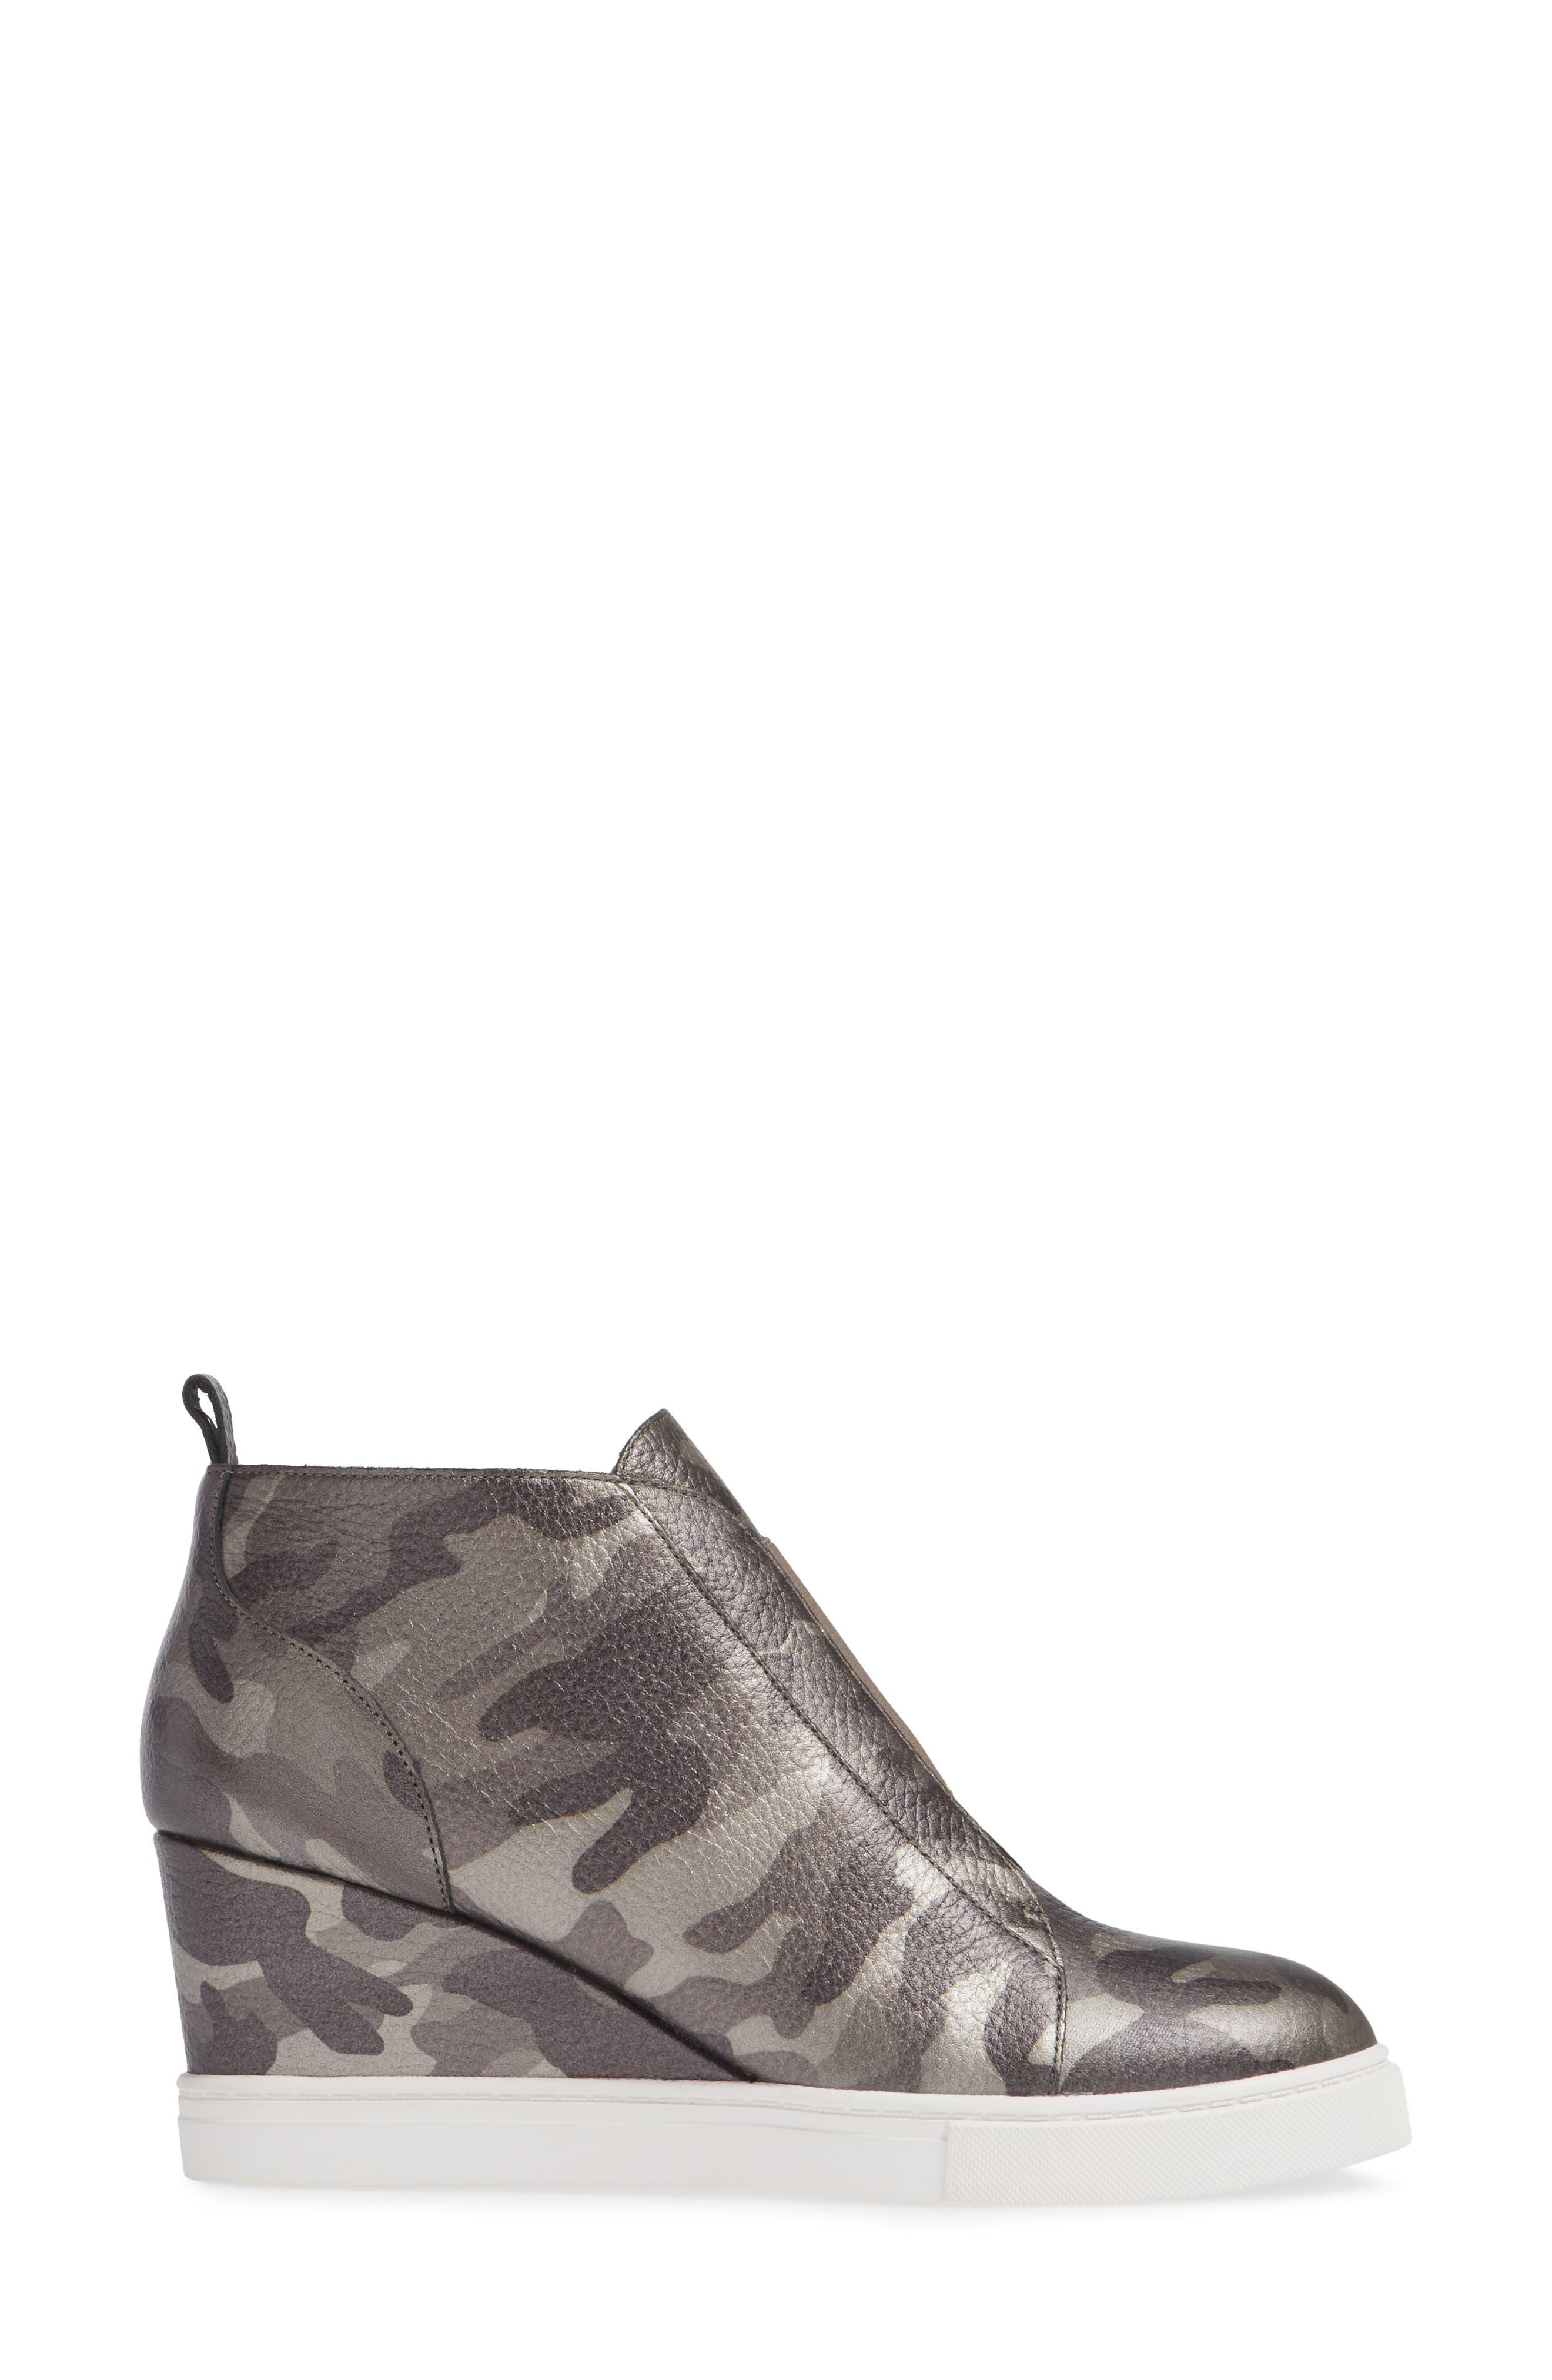 'Felicia' Wedge Bootie,                             Alternate thumbnail 4, color,                             Dark Grey Print Leather